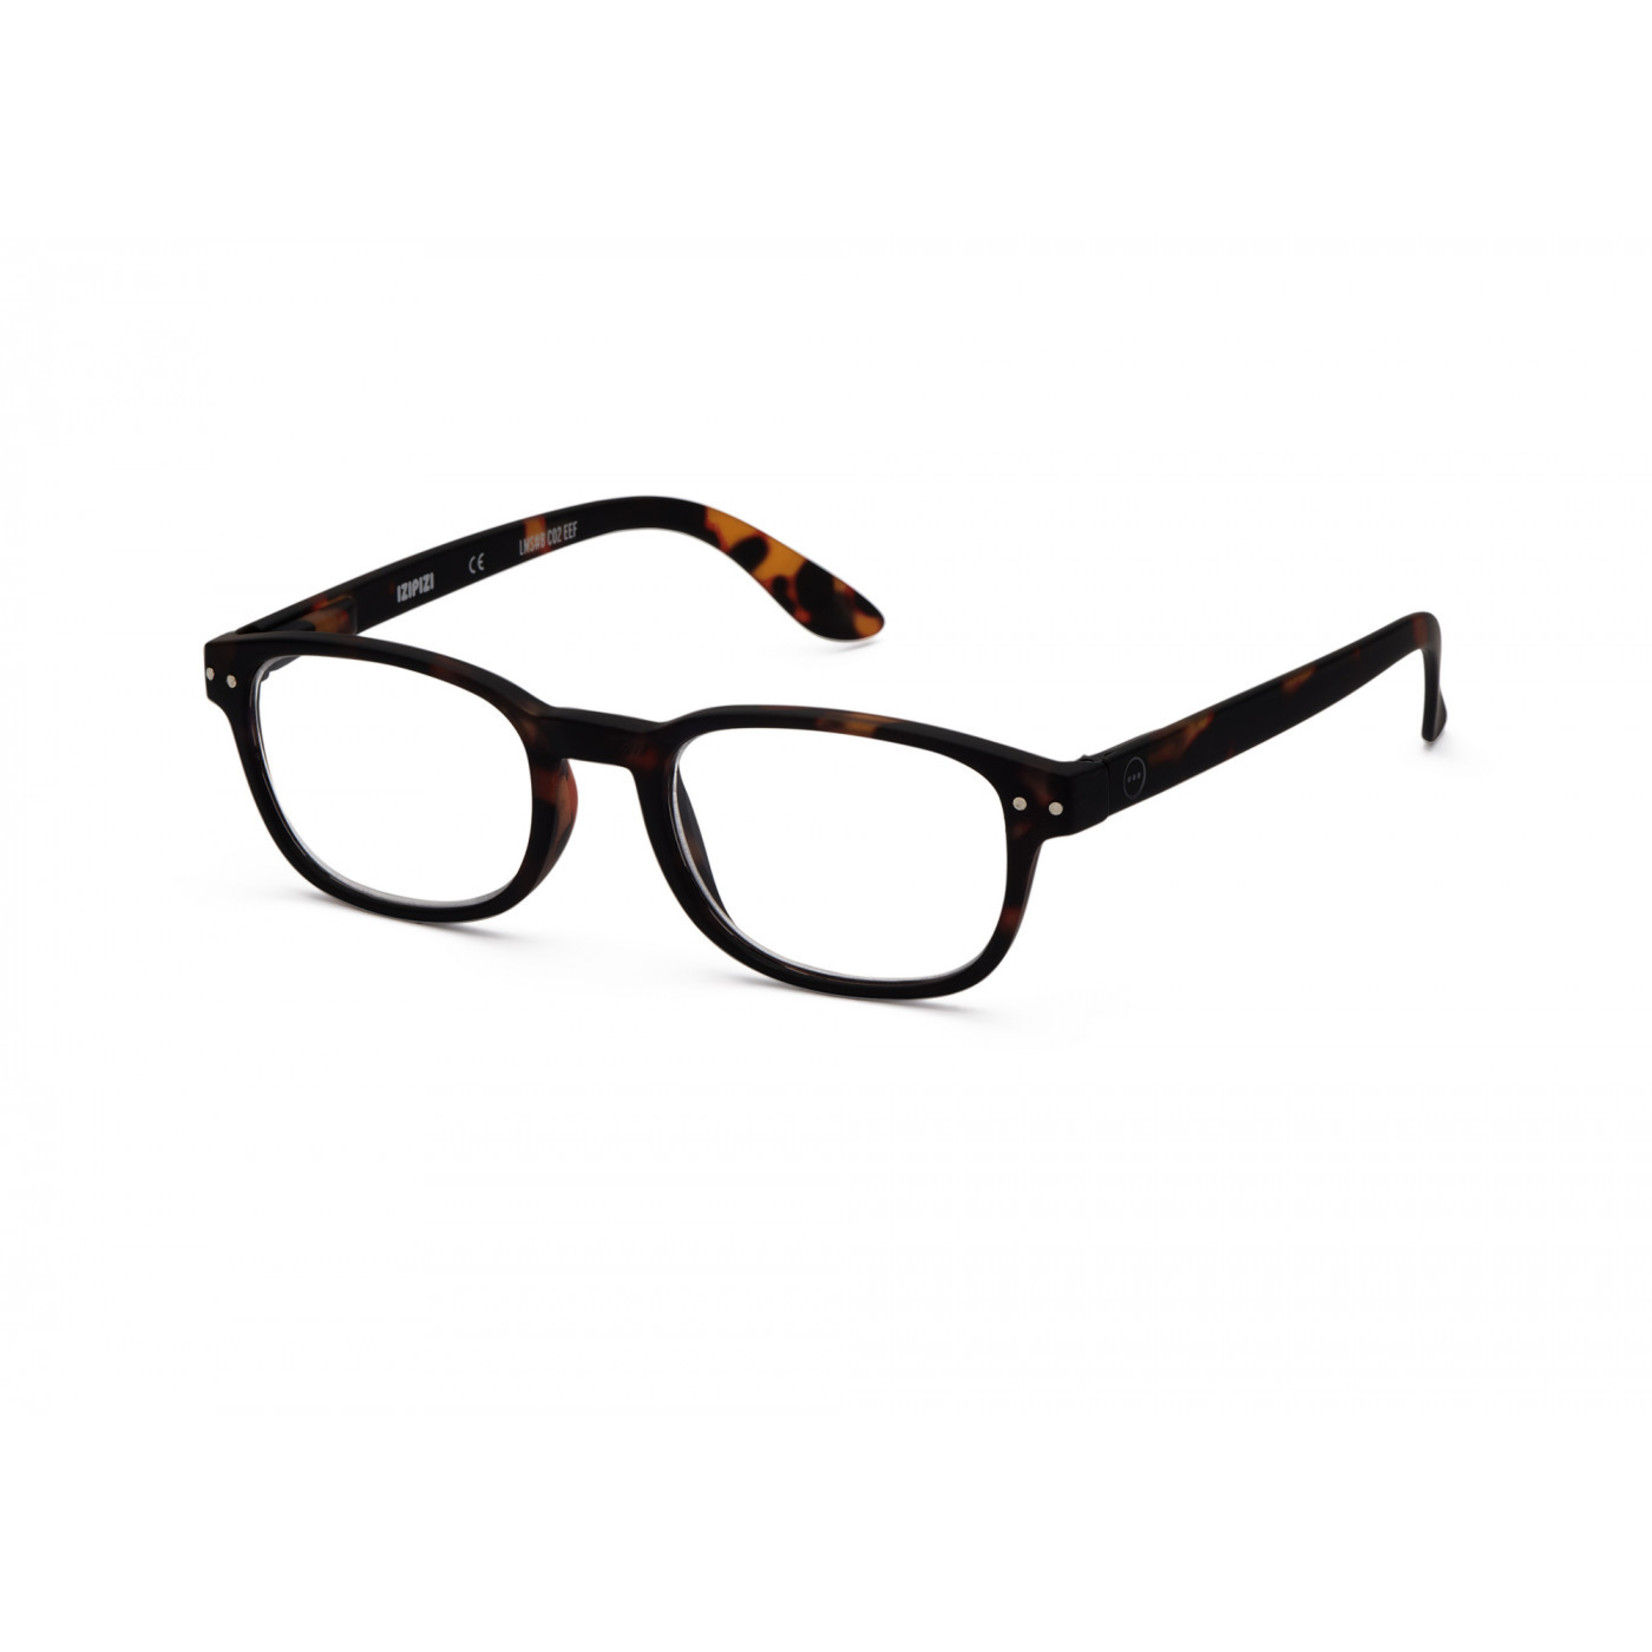 IZIPIZI #B The Rectangular Reading Glasses